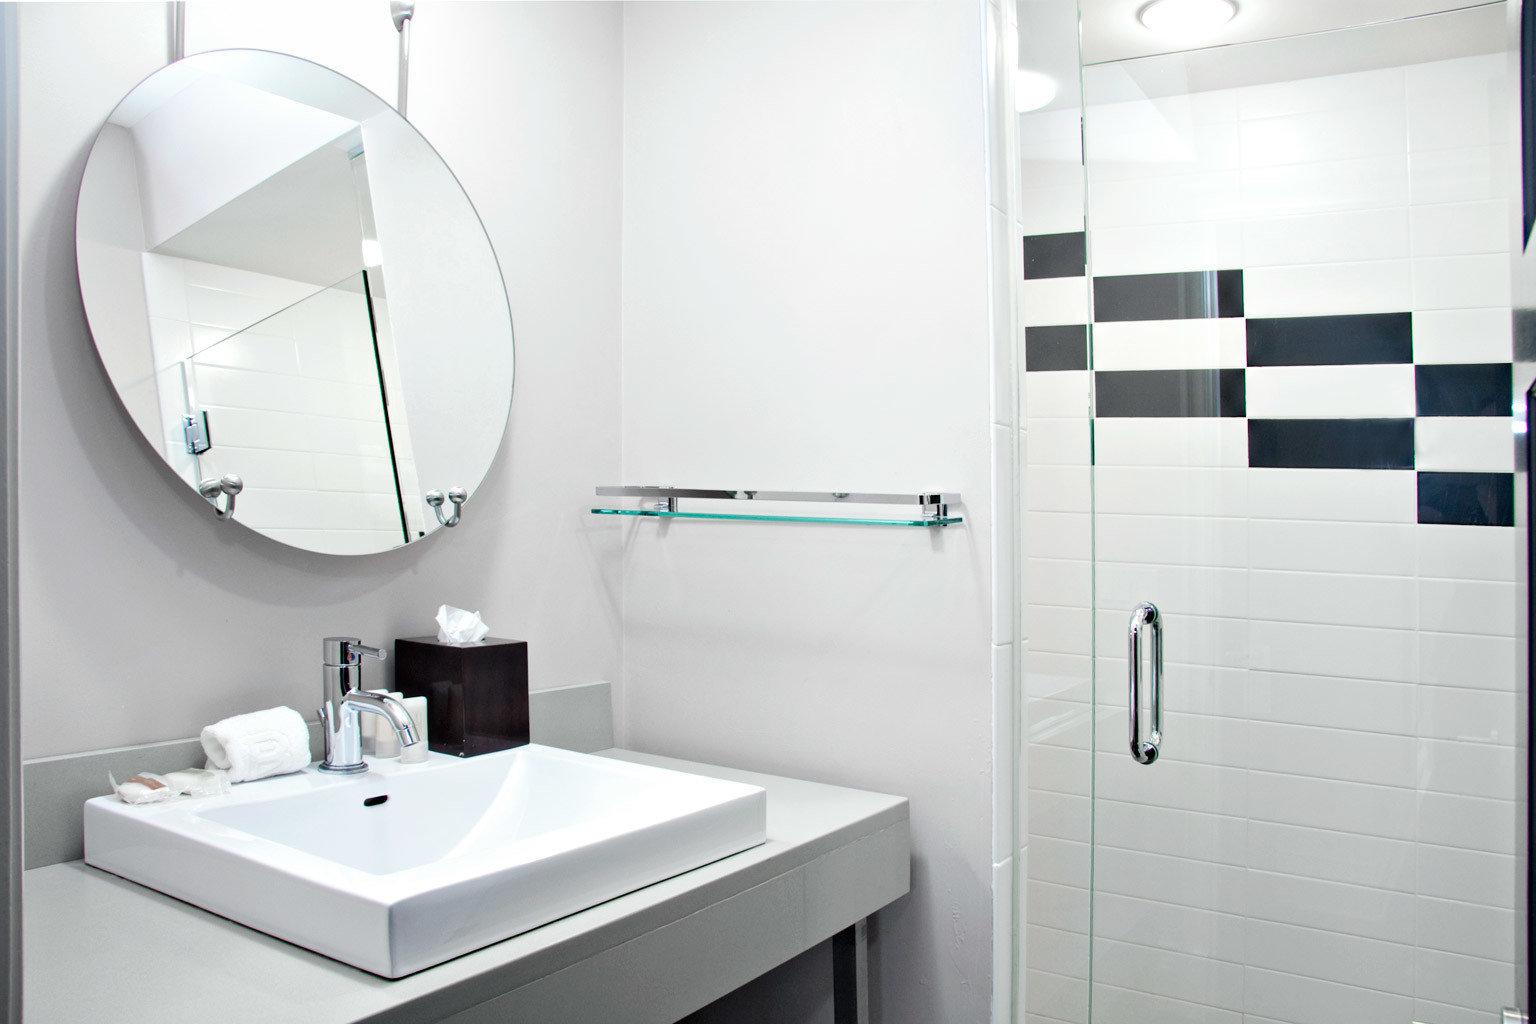 Bath Luxury bathroom toilet plumbing fixture bidet white sink bathroom cabinet flooring